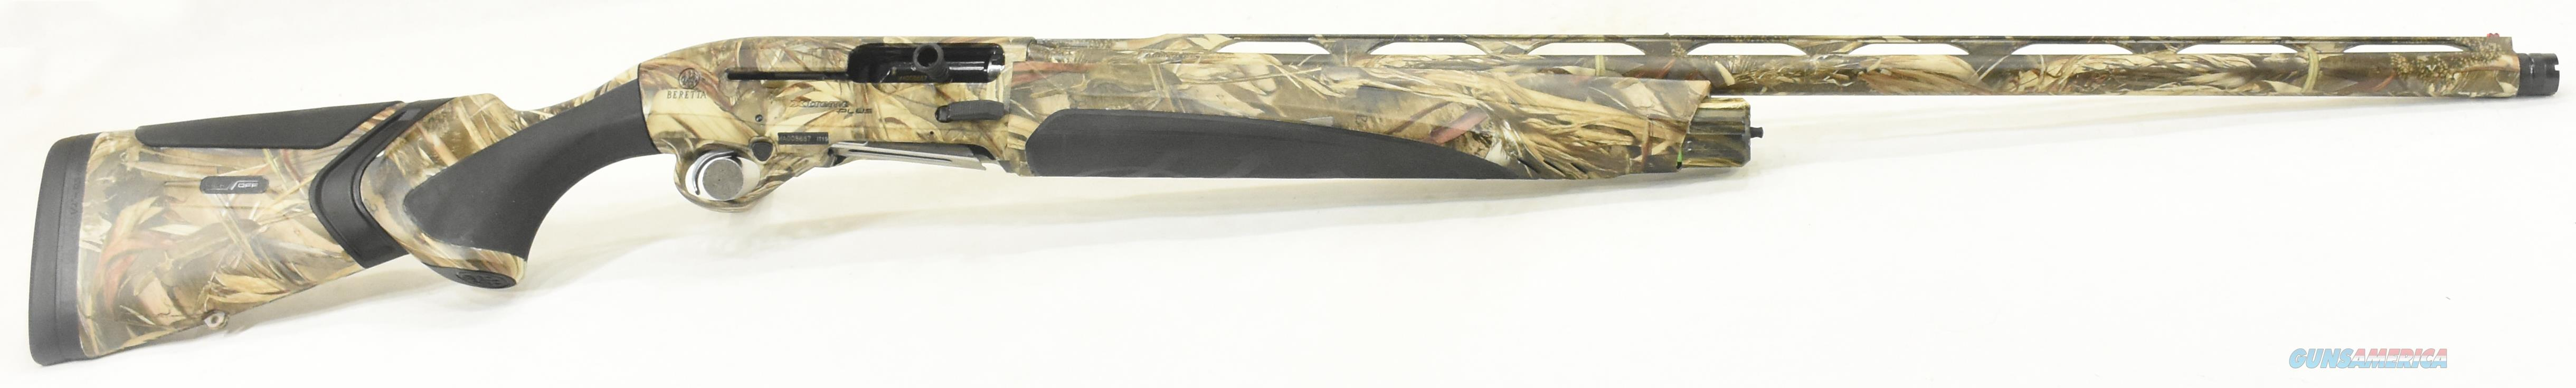 A400 Xtreme KO True Timber 12Ga 30-3.5In  J42XZ10  Guns > Shotguns > Beretta Shotguns > Autoloaders > Hunting